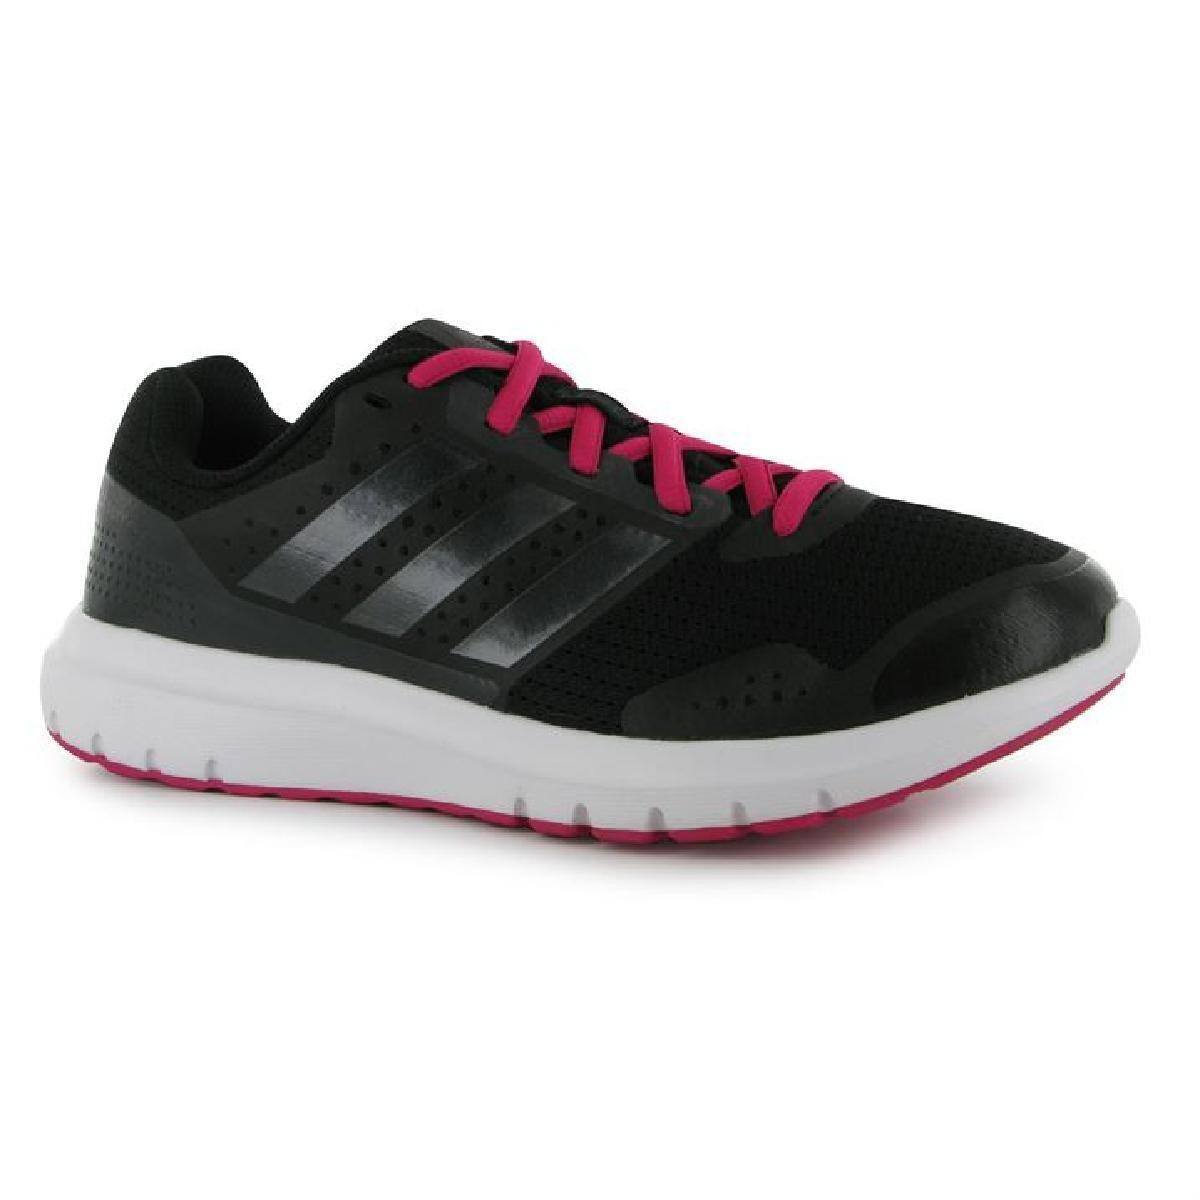 Adidas Damen Schuhe Turnschuhe Laufschuhe Gr Gr Gr 38.7 Turnschuhe Trainers Duramo 7  | Modern Und Elegant In Der Mode  312341